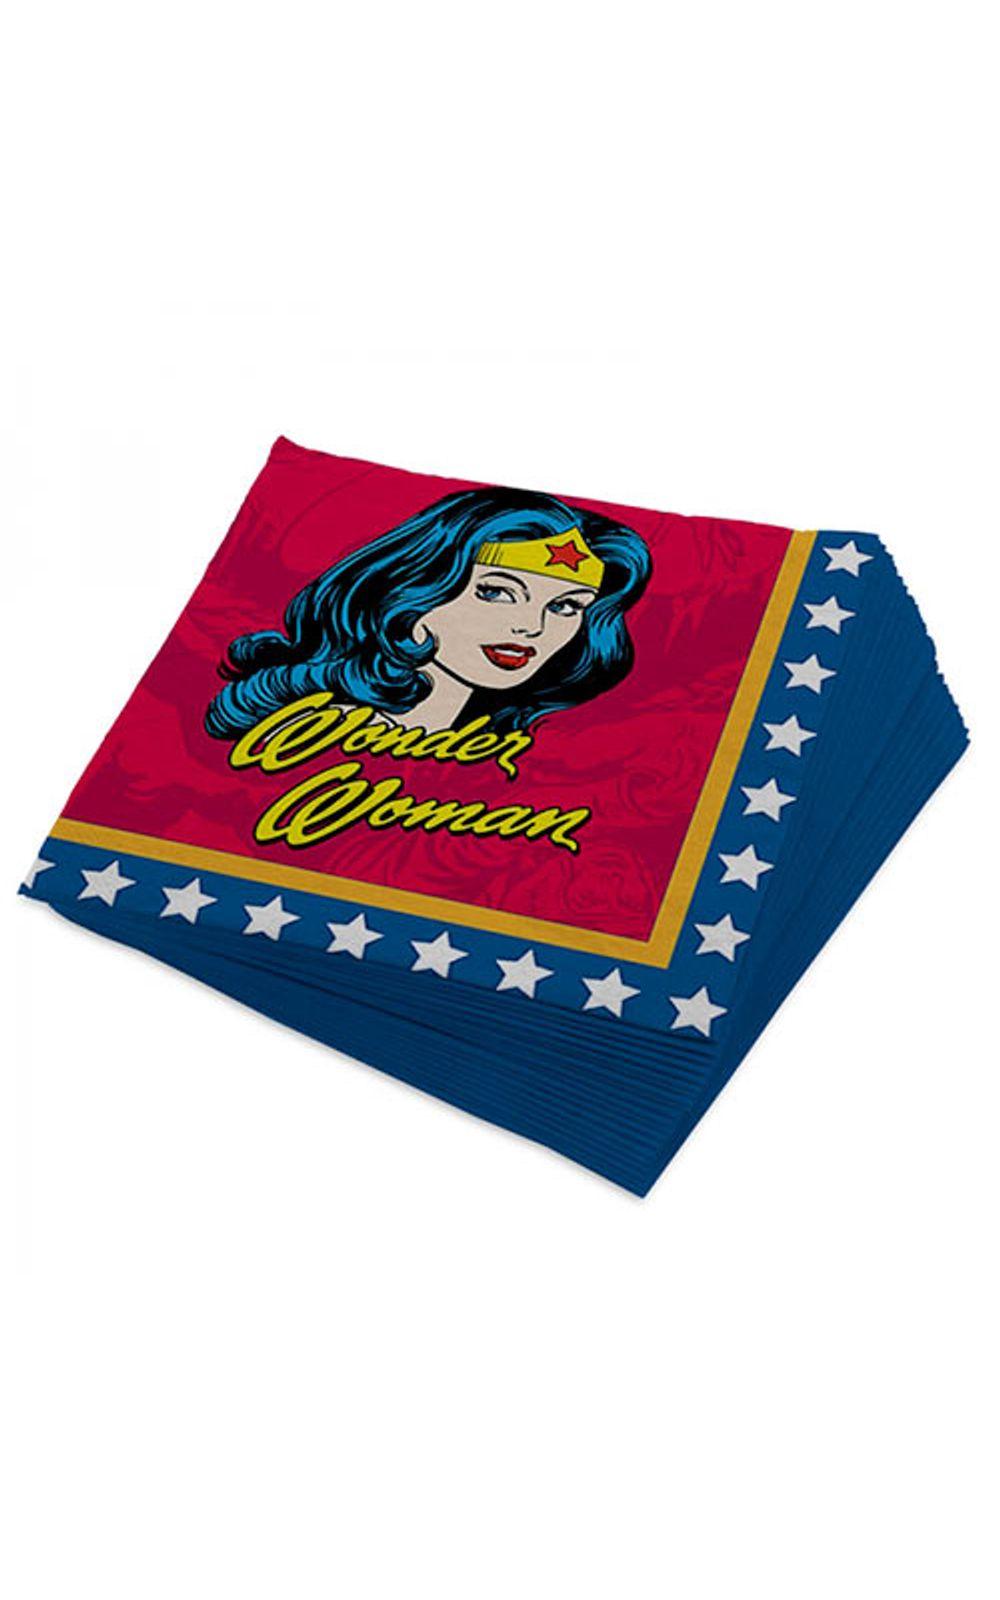 Foto 1 - Guardanapo Mulher Maravilha Quadrinhos HQ DC Comics